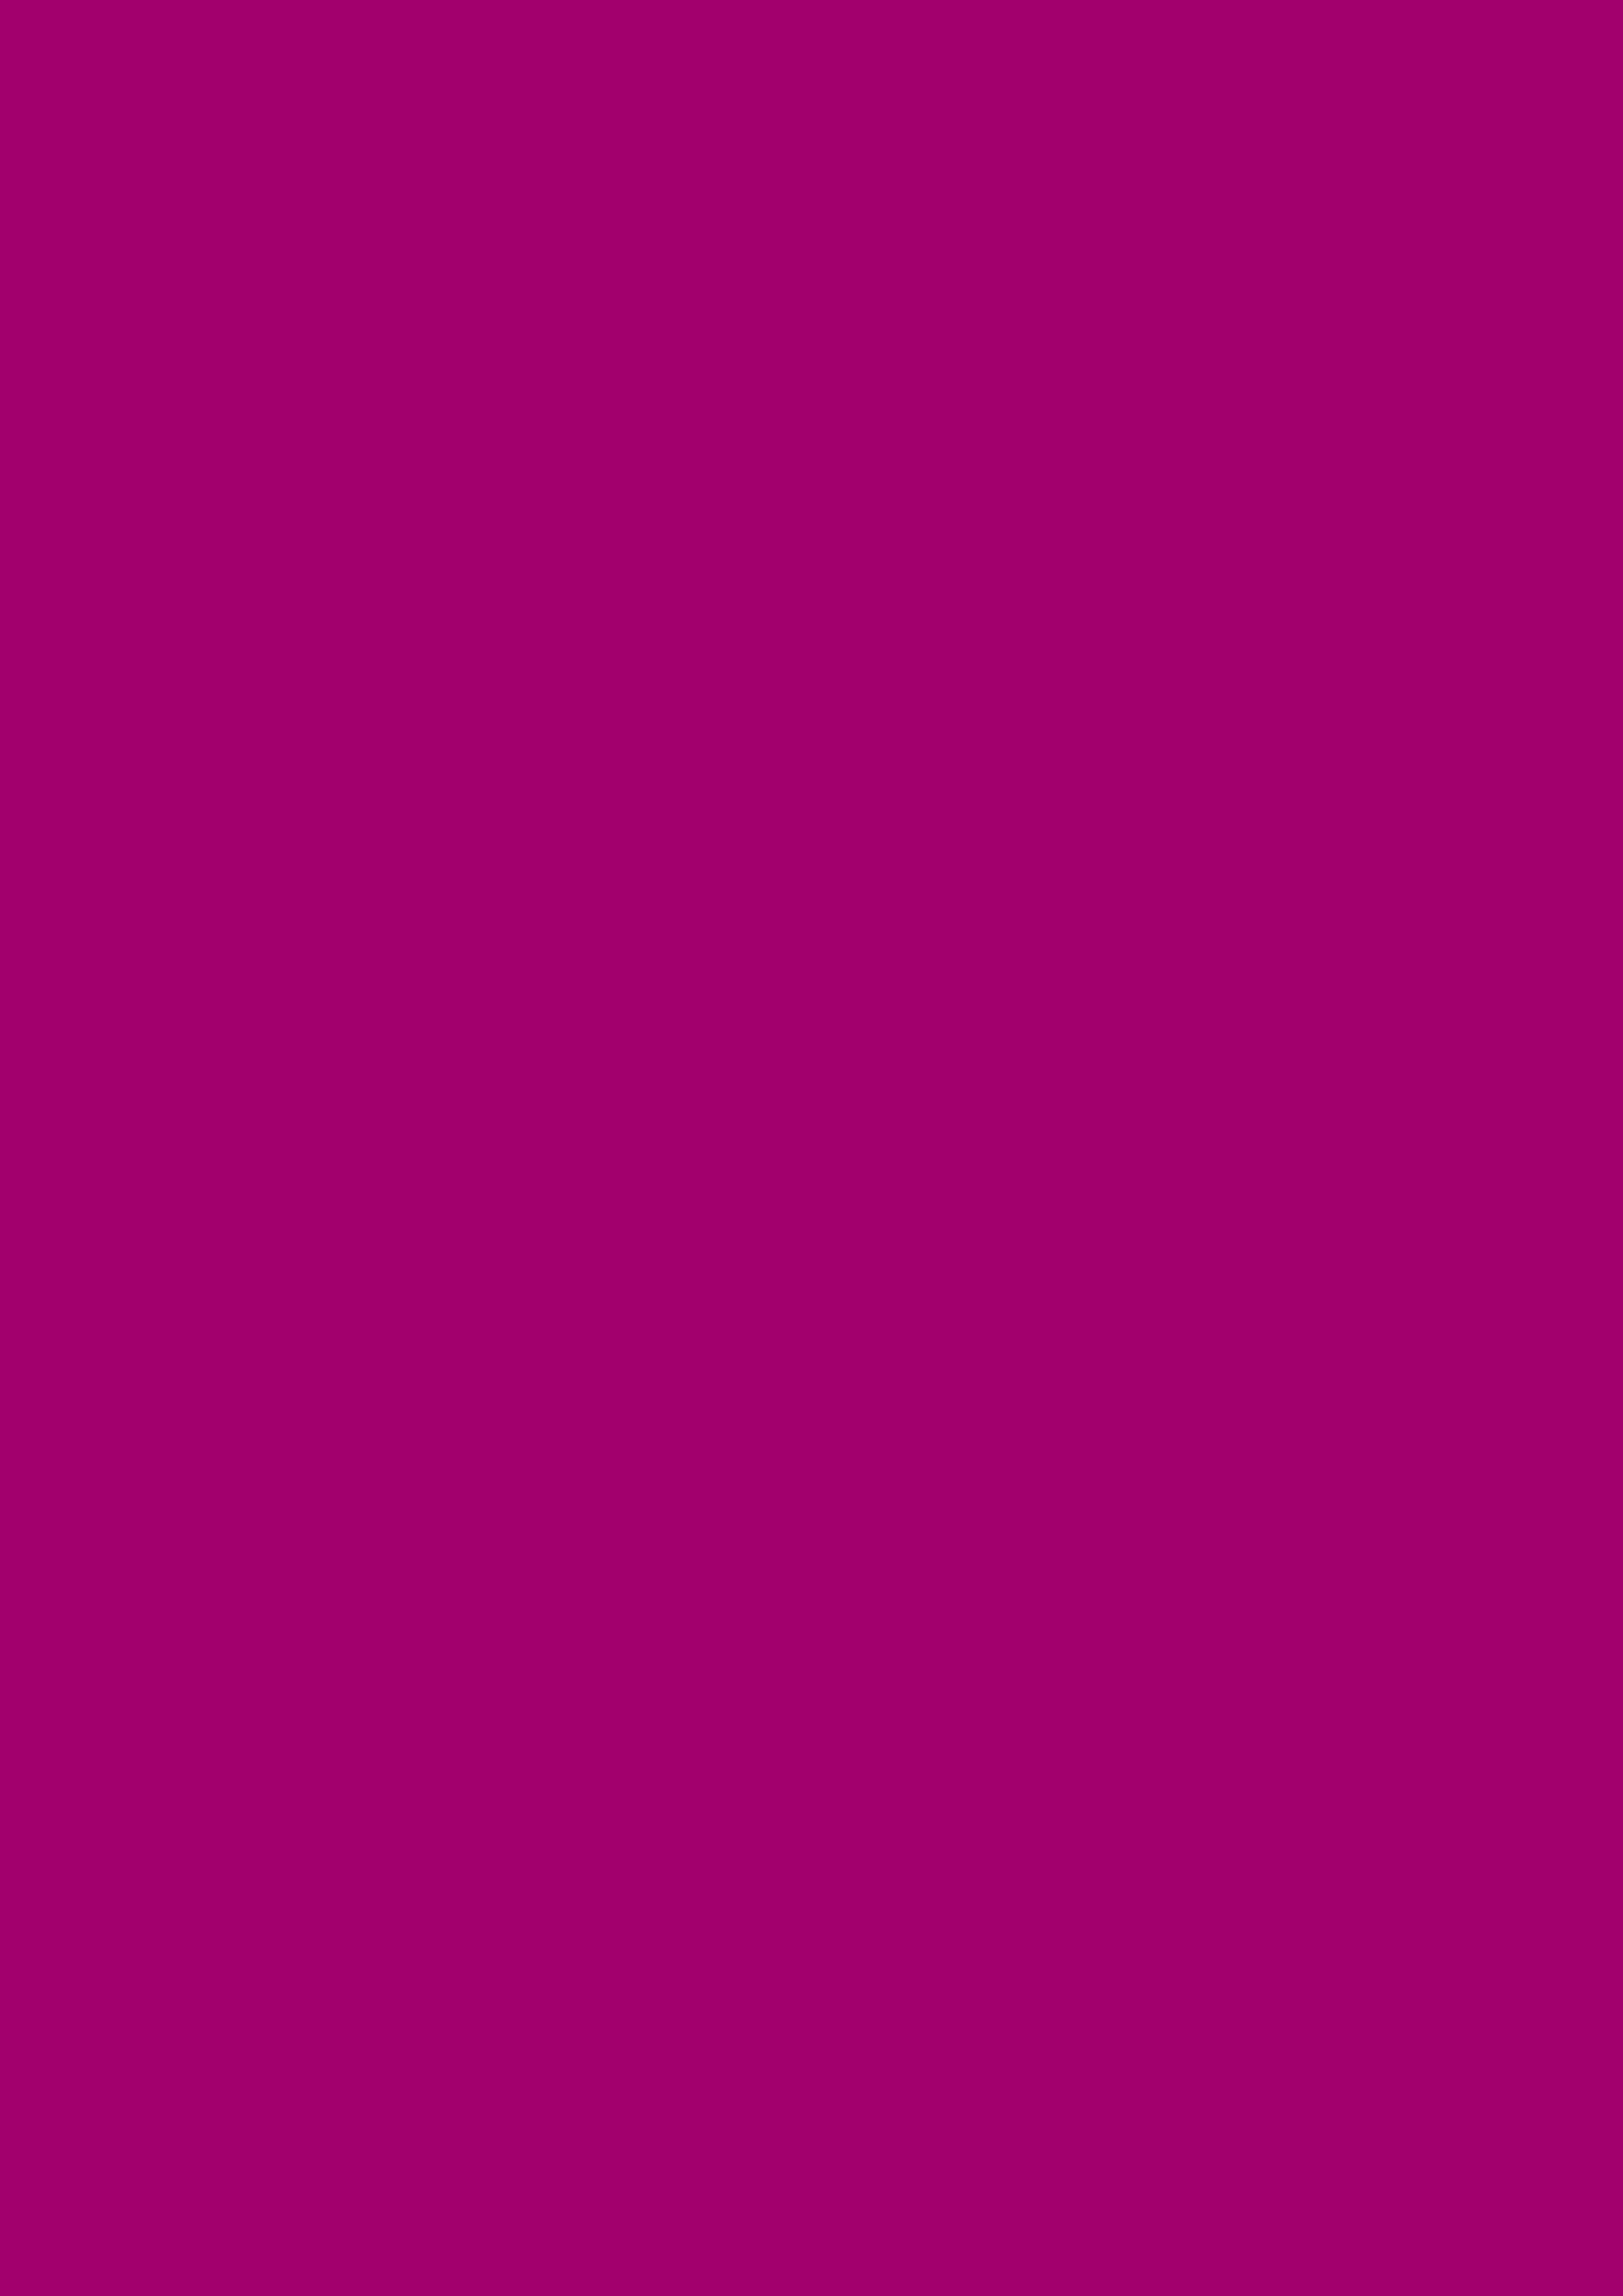 2480x3508 Flirt Solid Color Background